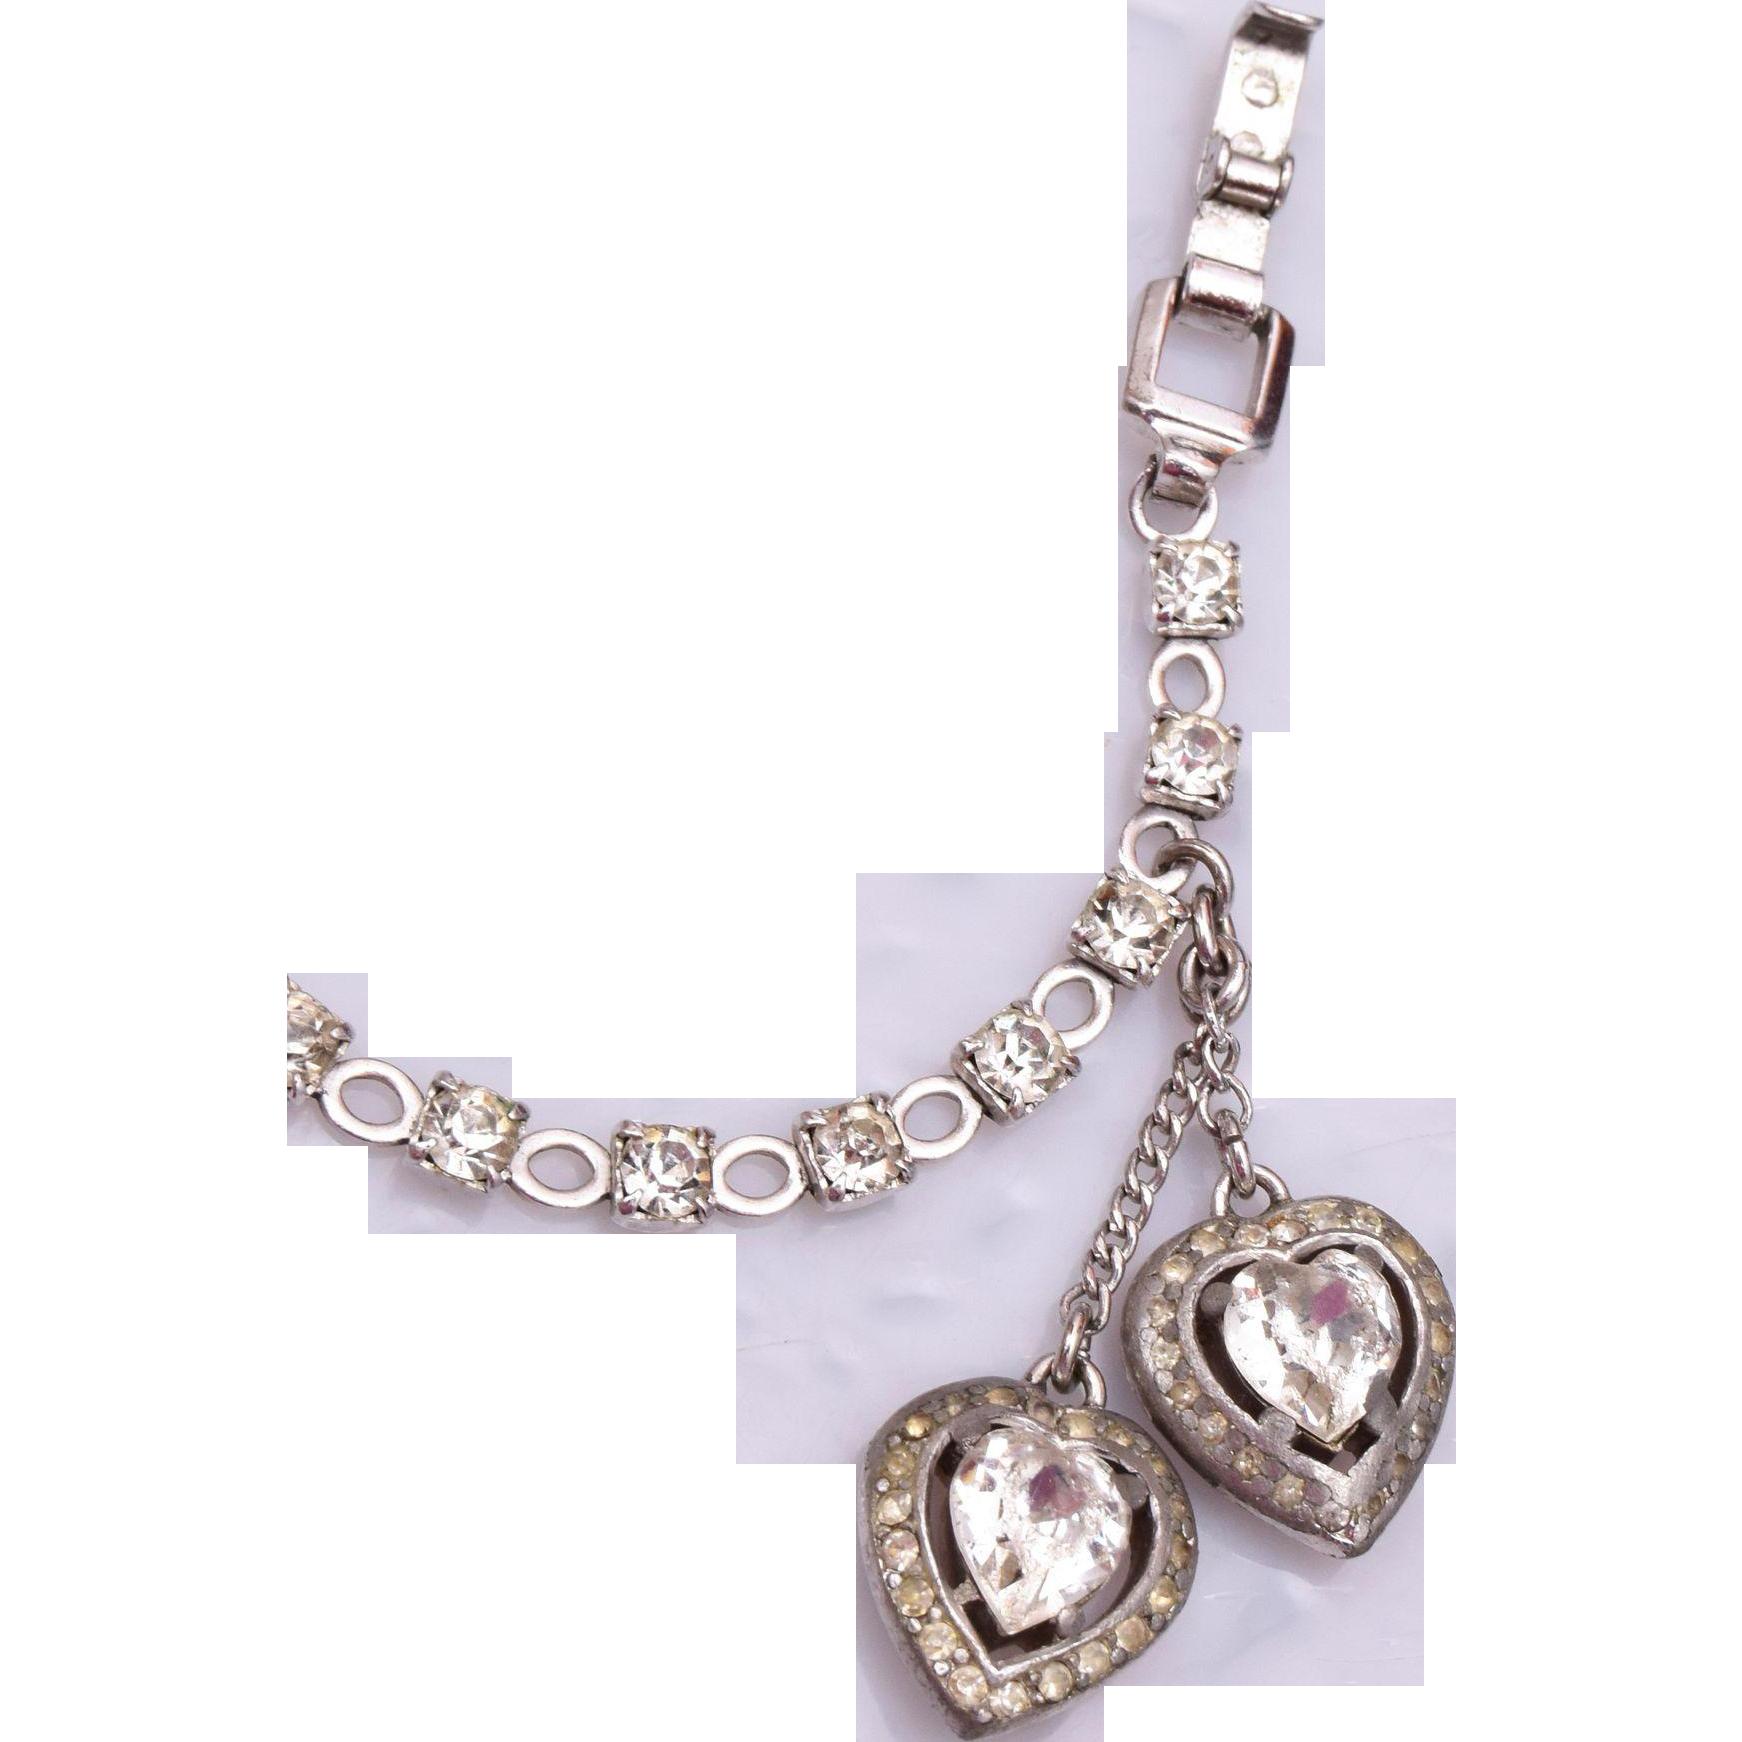 Trifari Heart and Rhinestone Bracelet